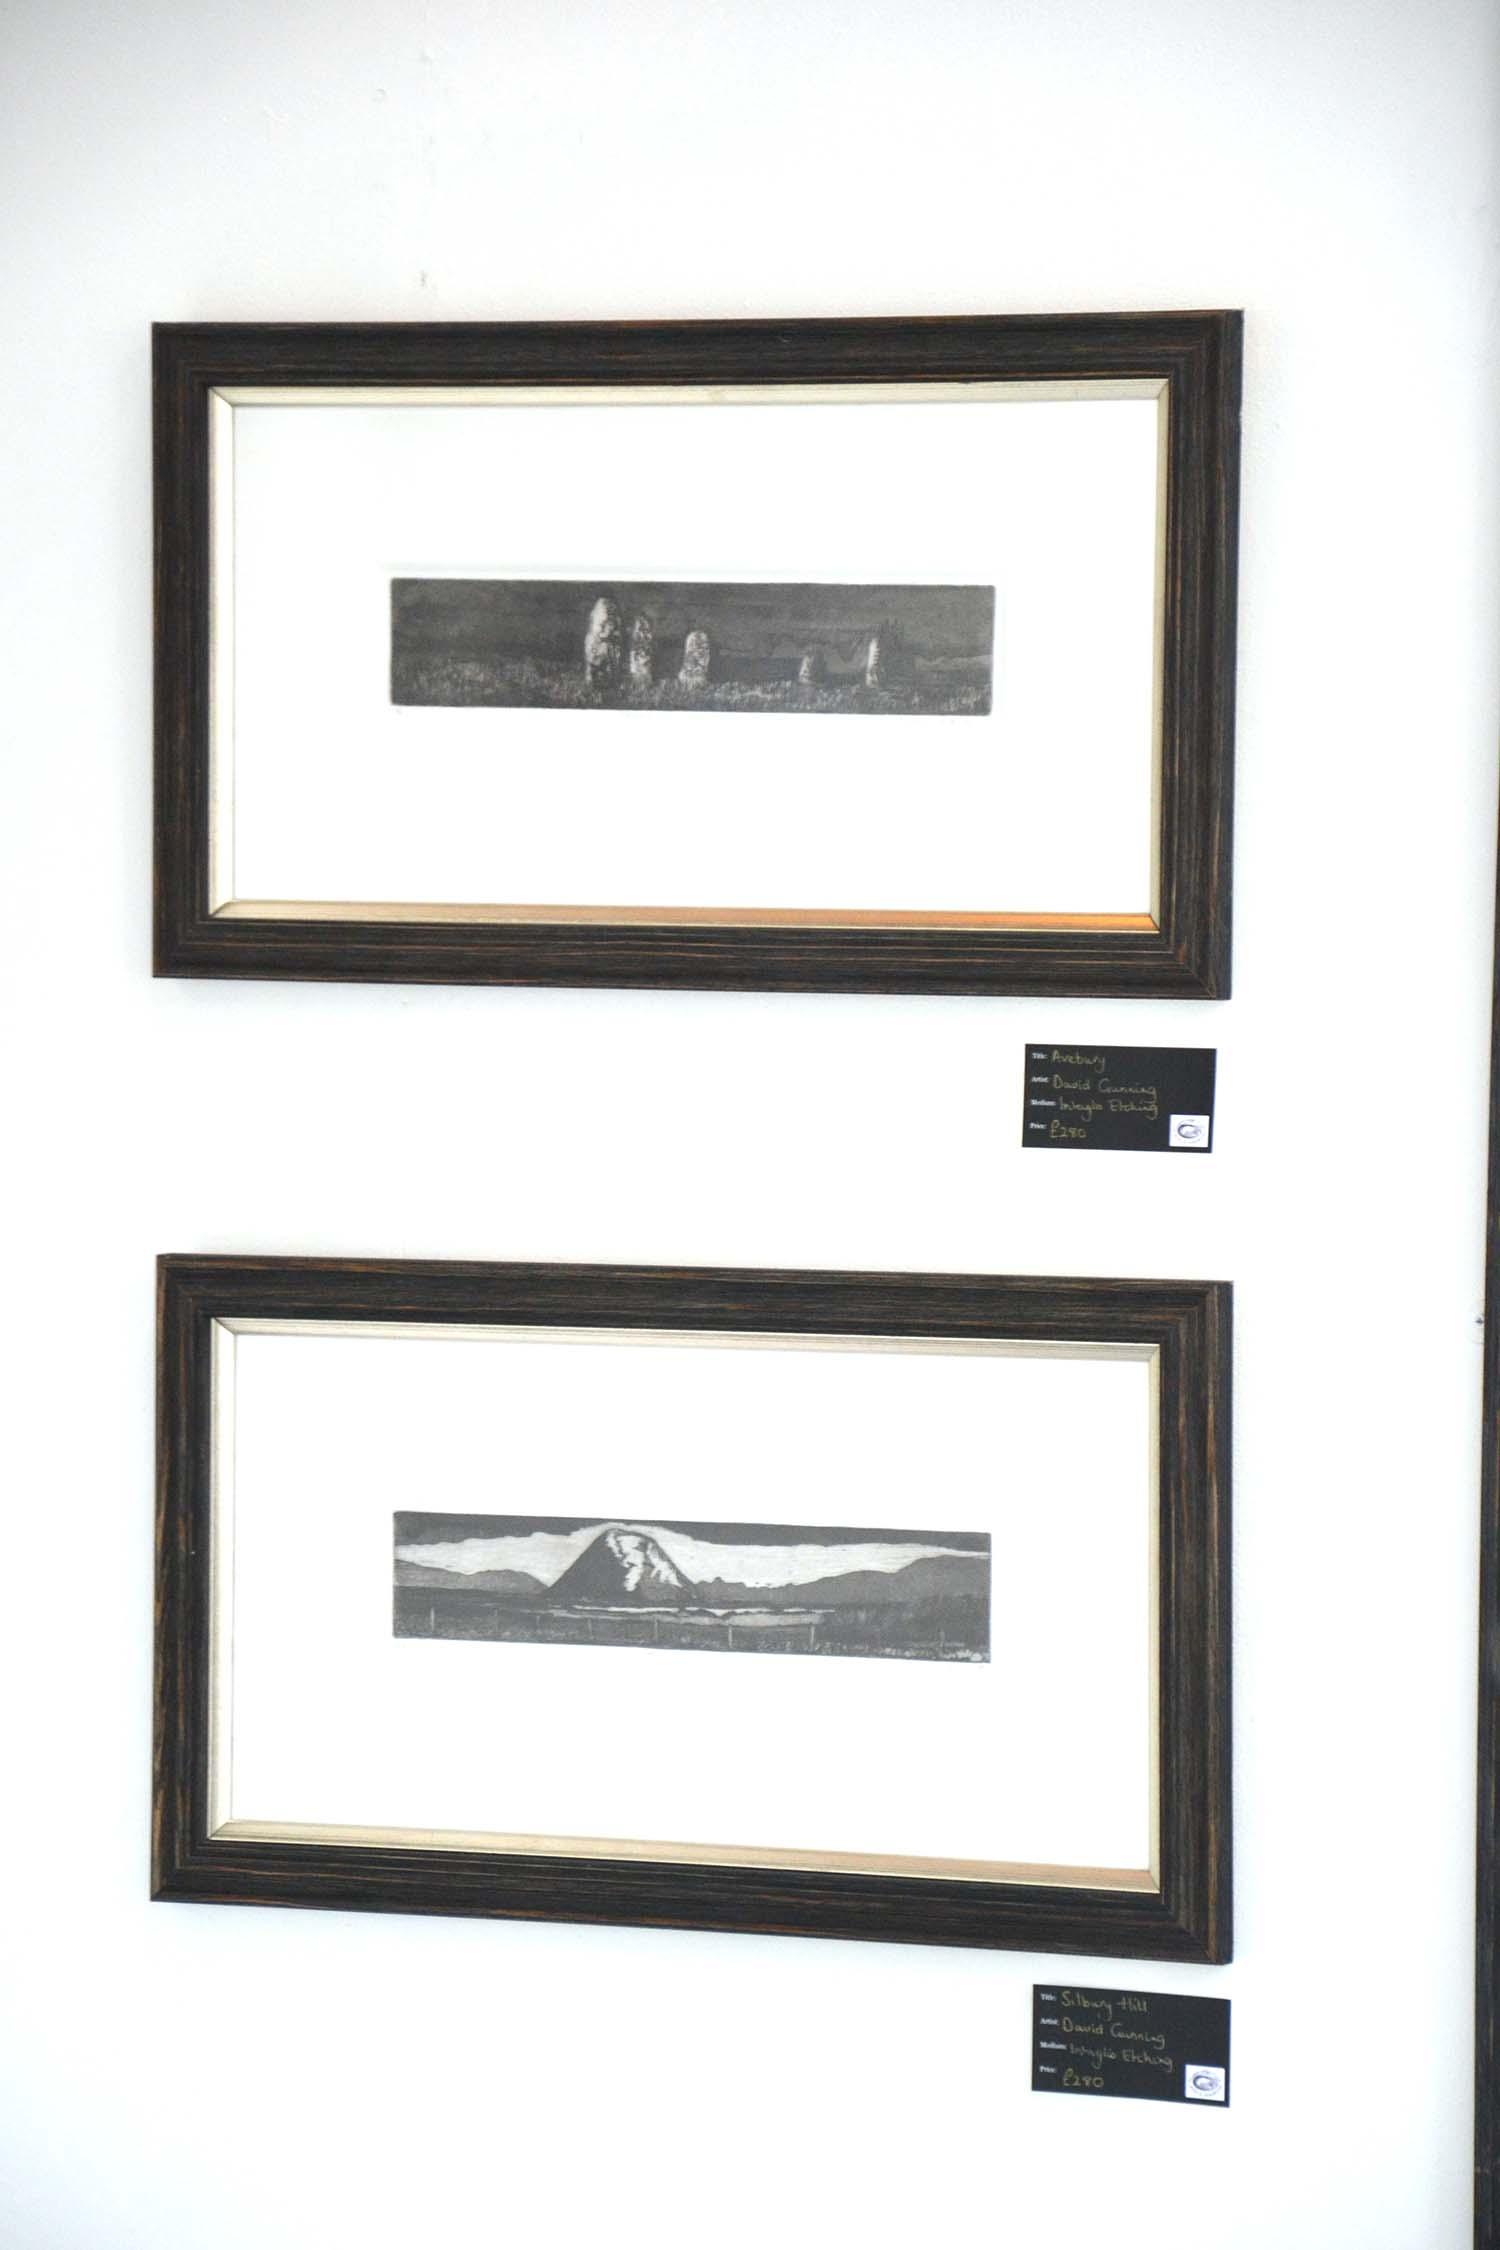 Exhibition-Image-7